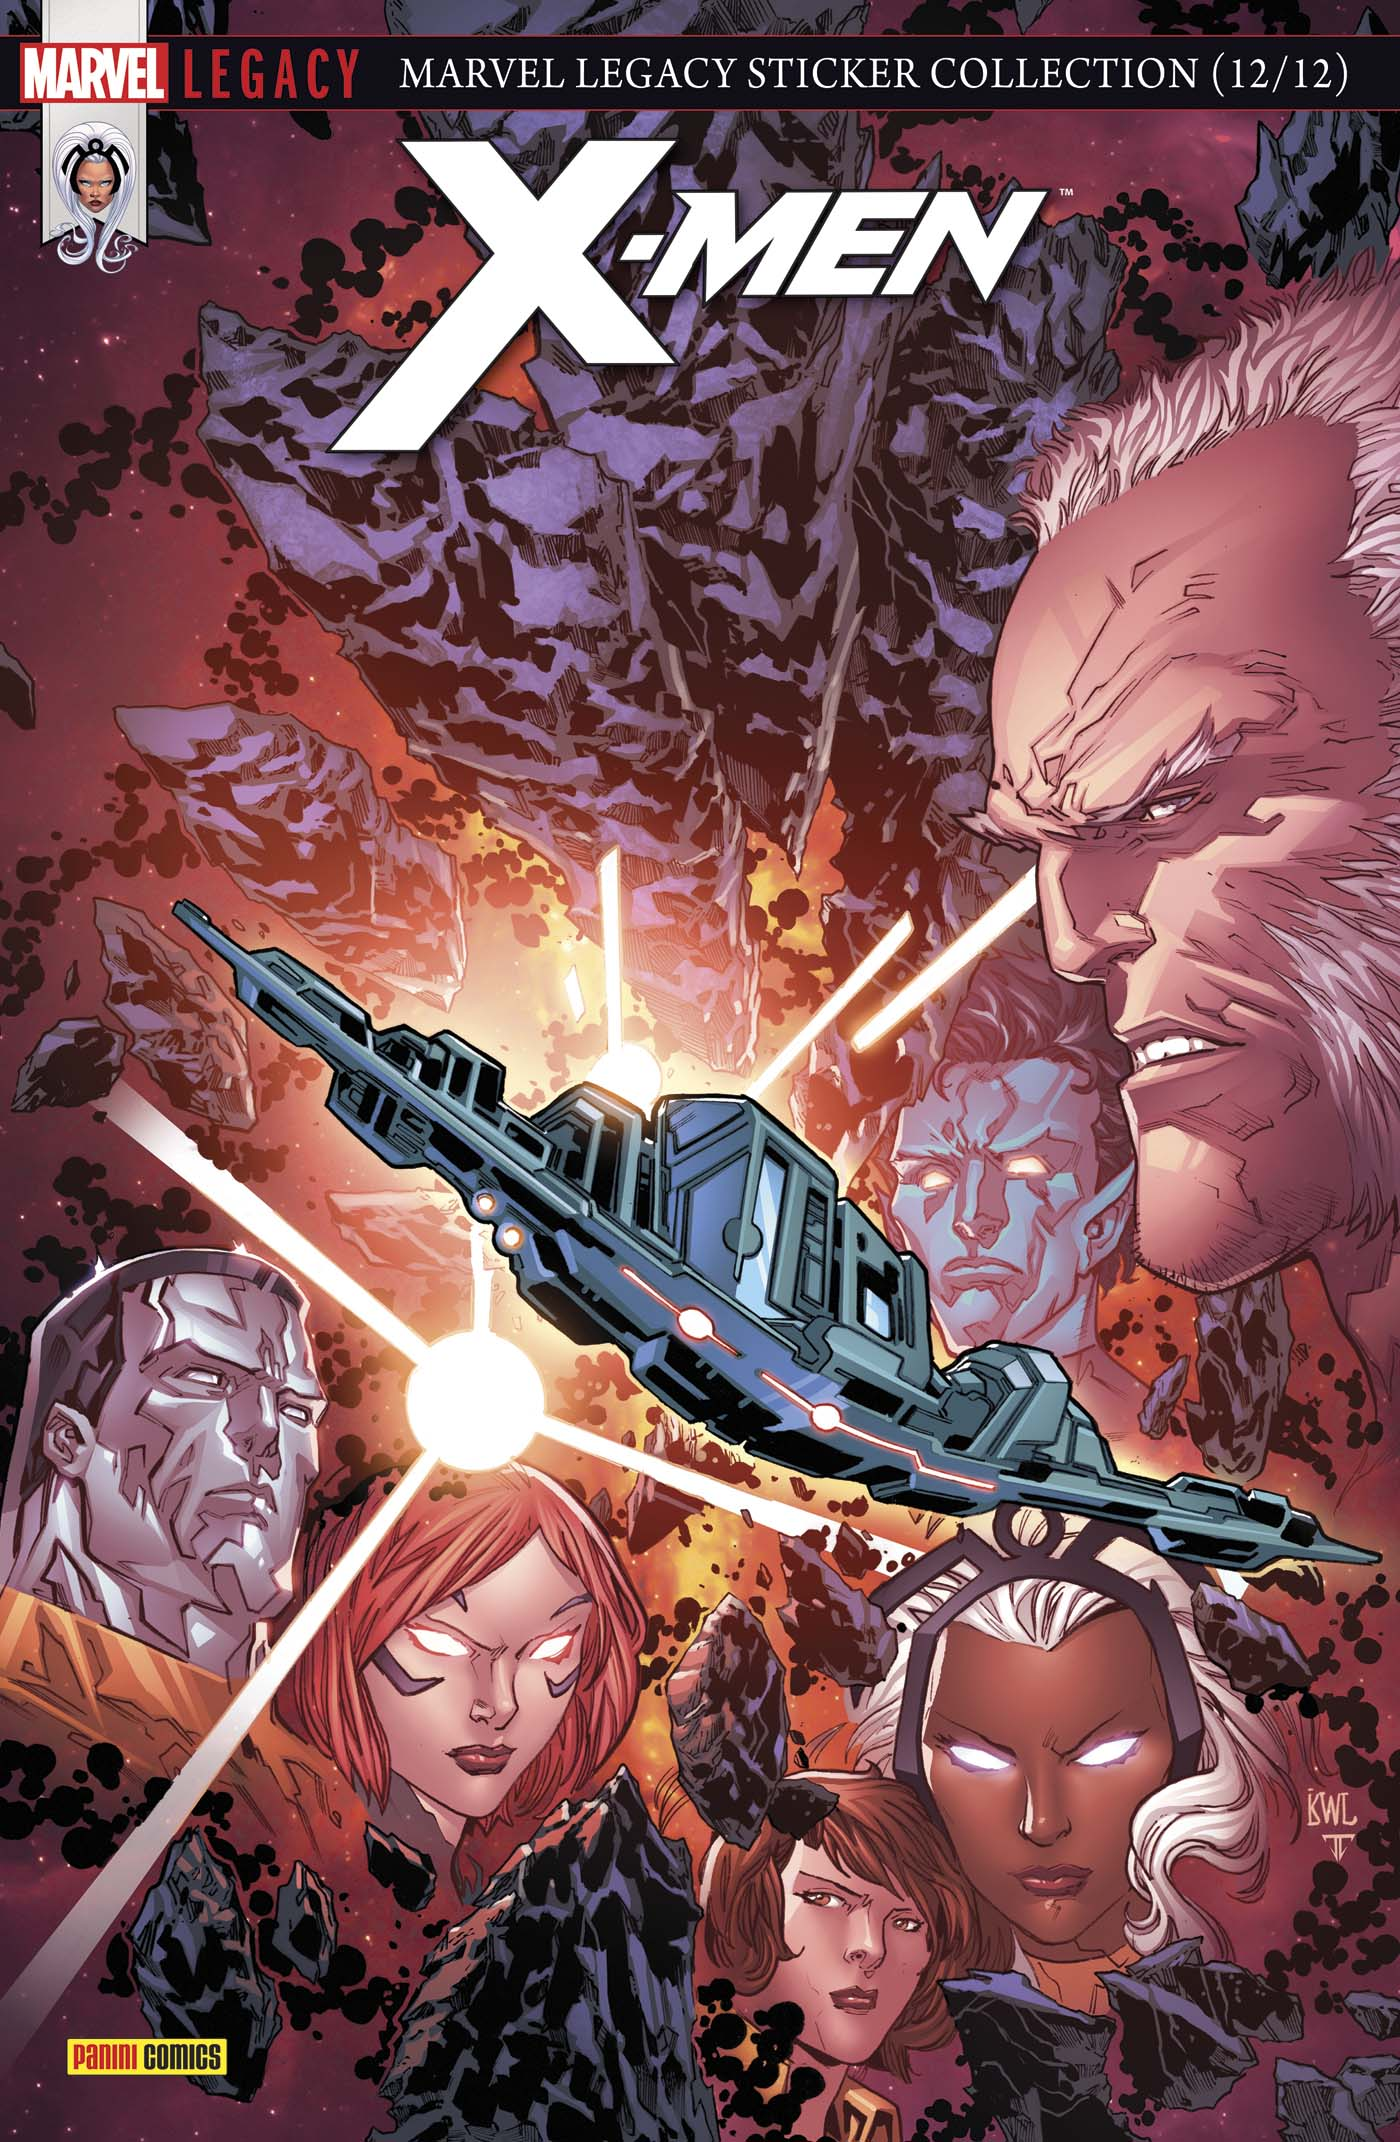 Marvel Legacy - X-Men 3